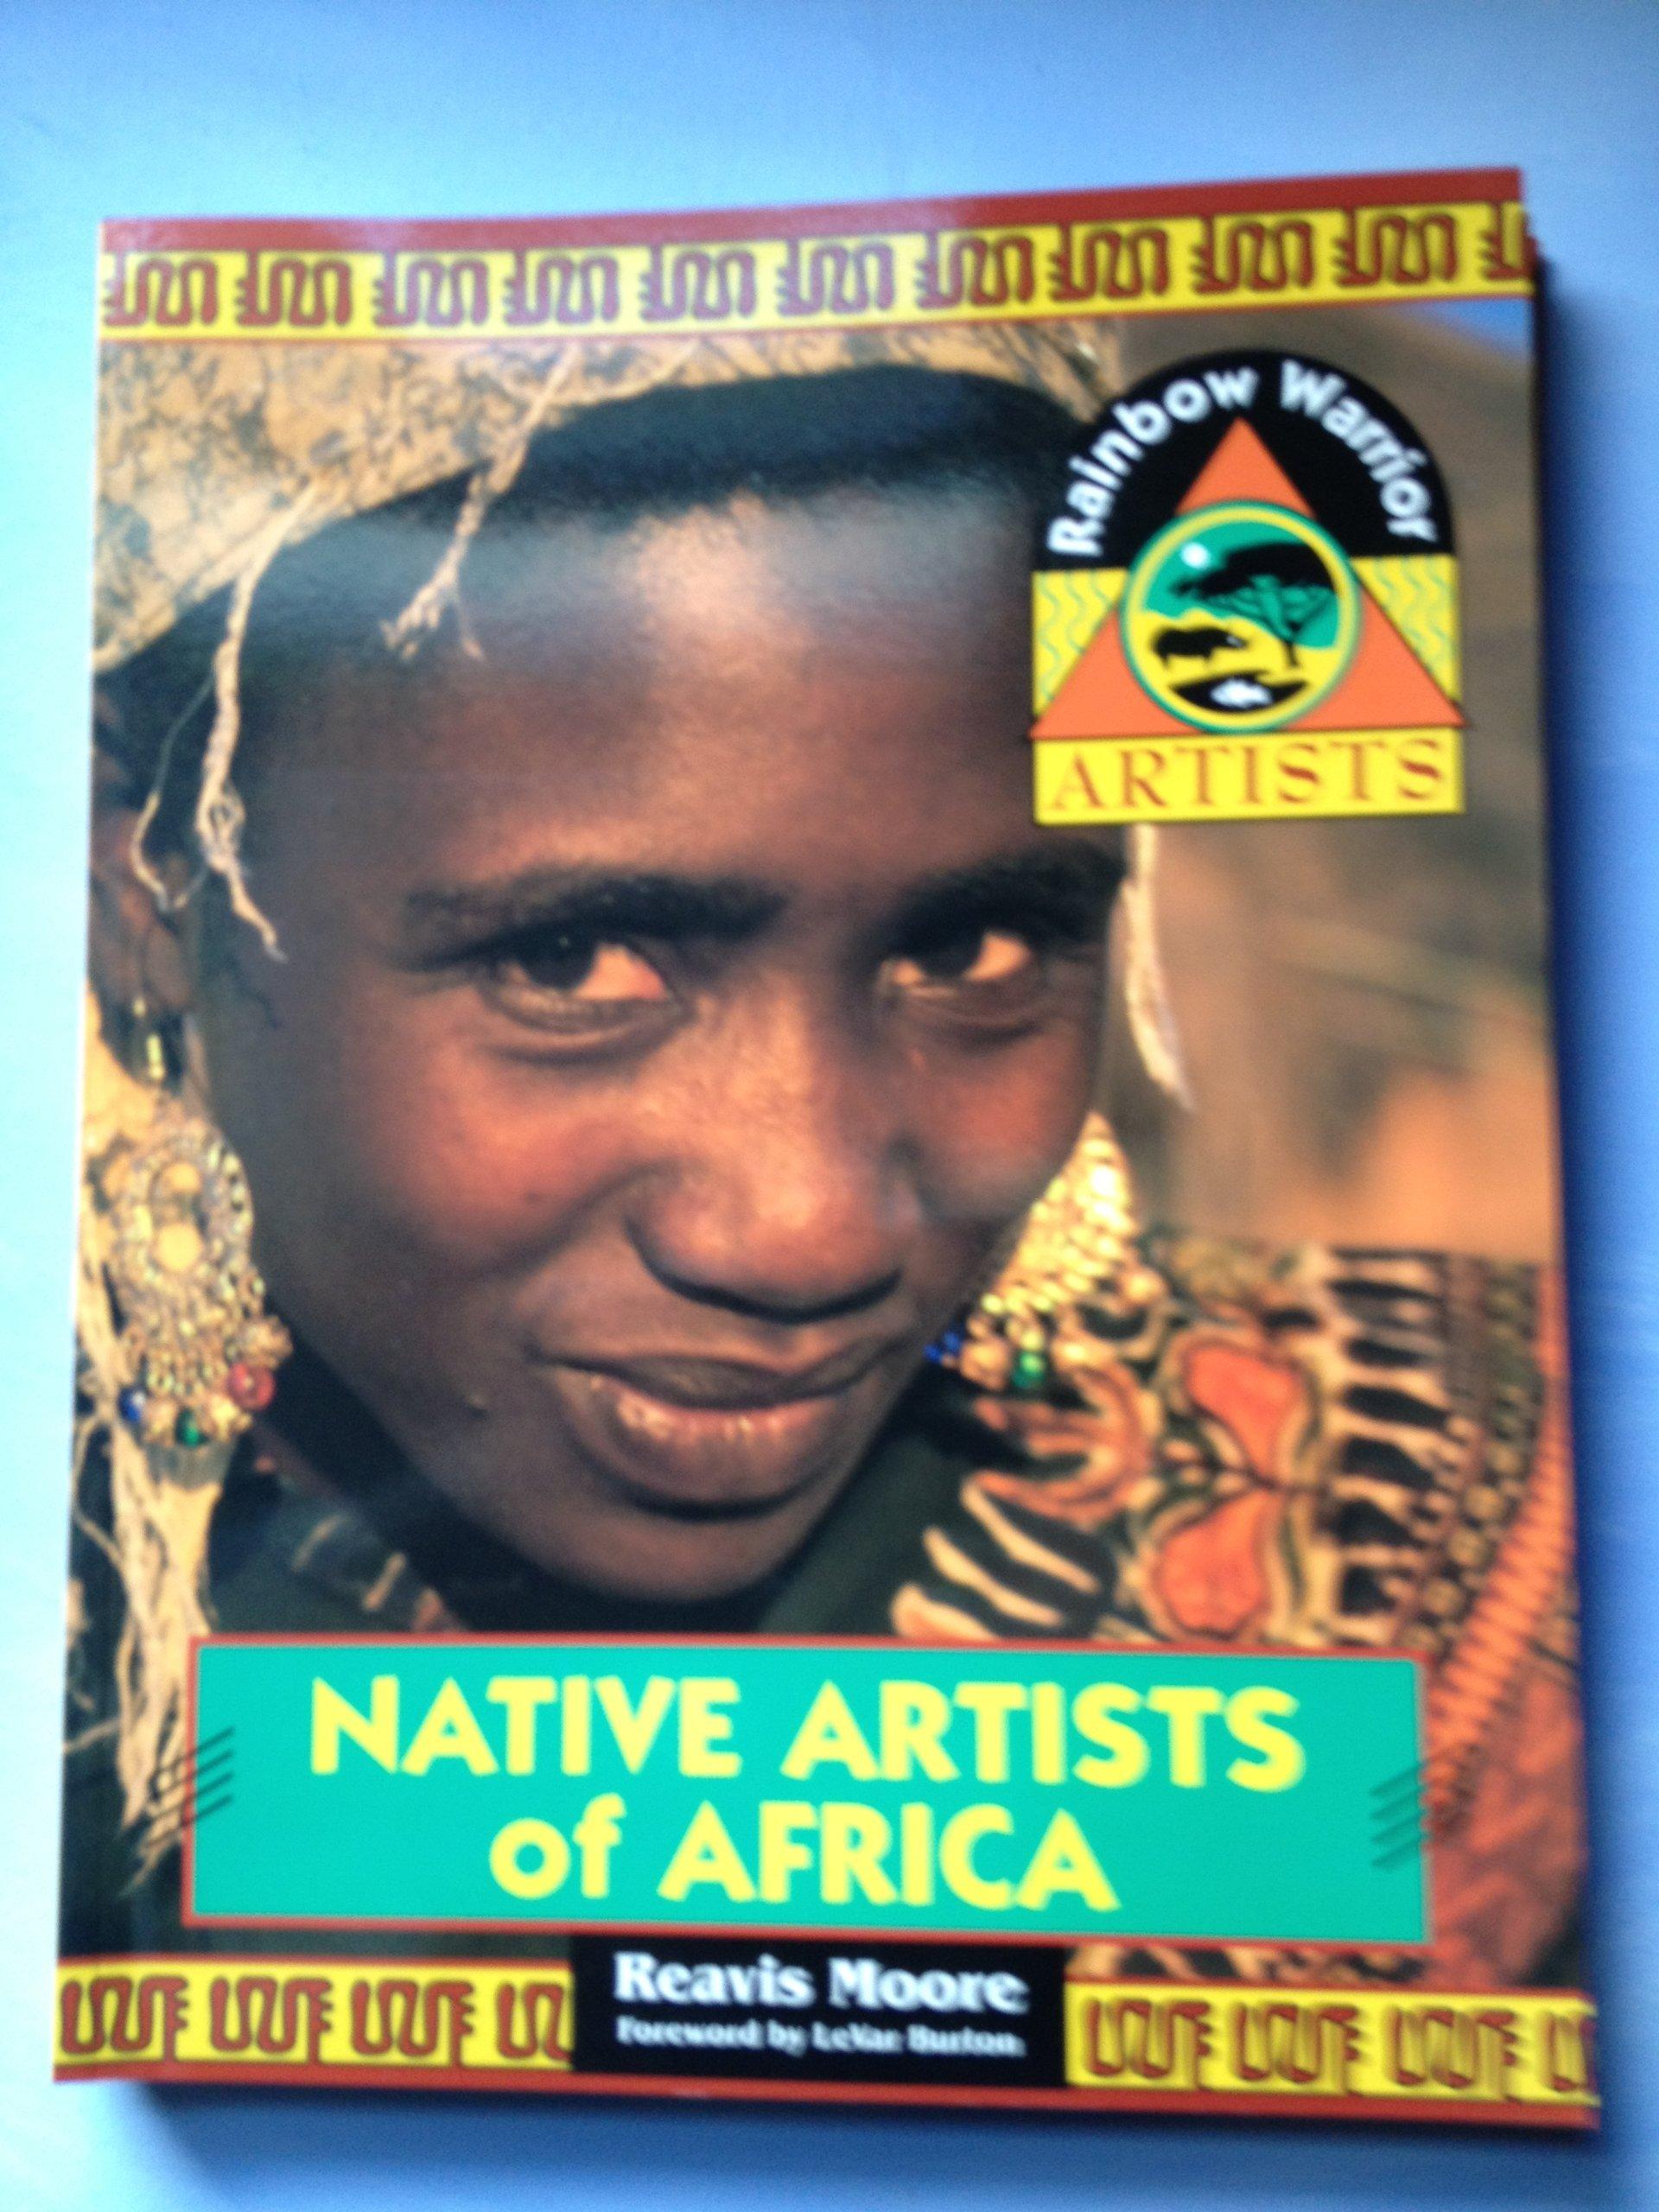 Native Artists of Africa (Rainbow Warrior Artists)